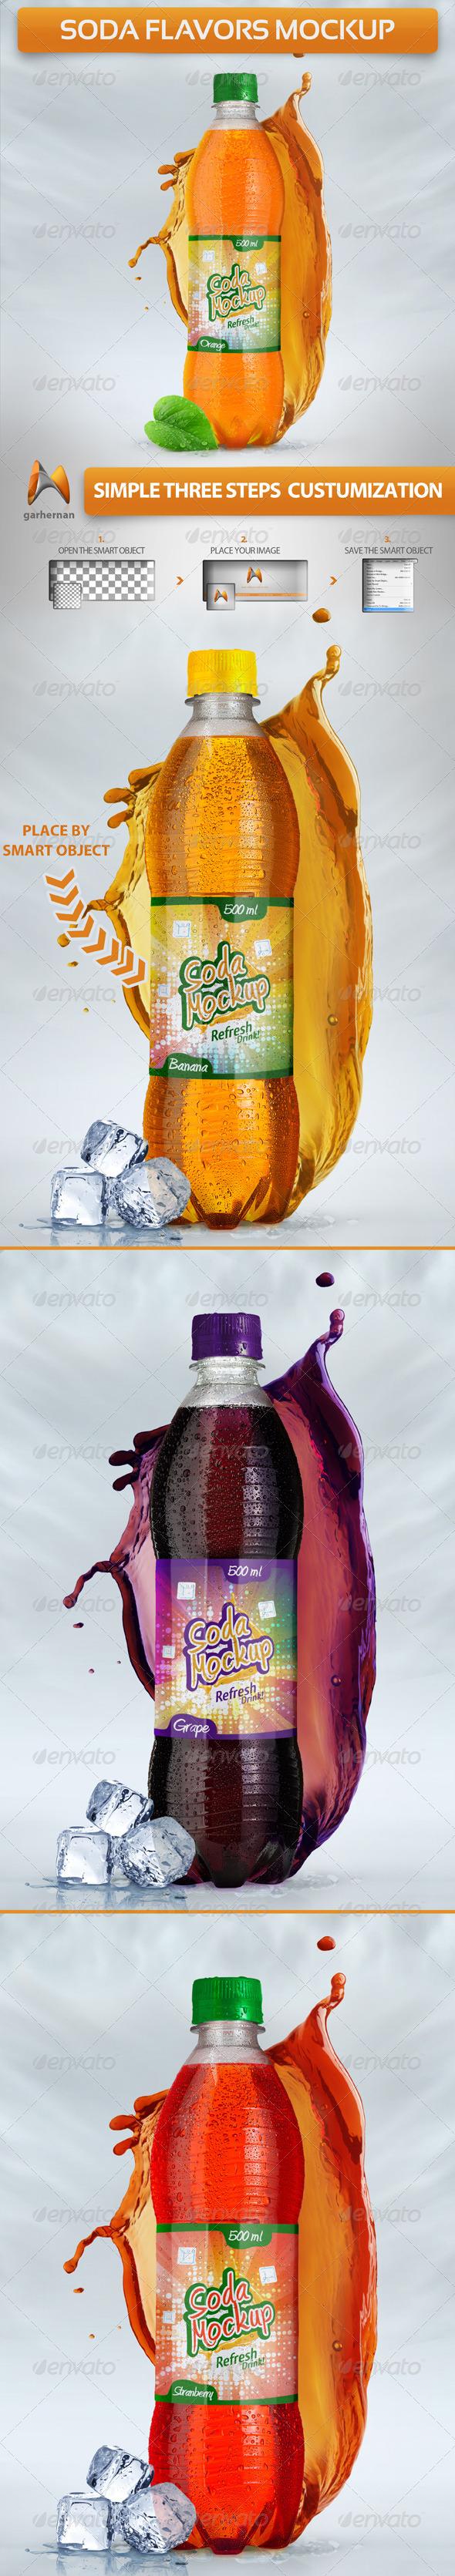 Soda Flavors Mock-Up